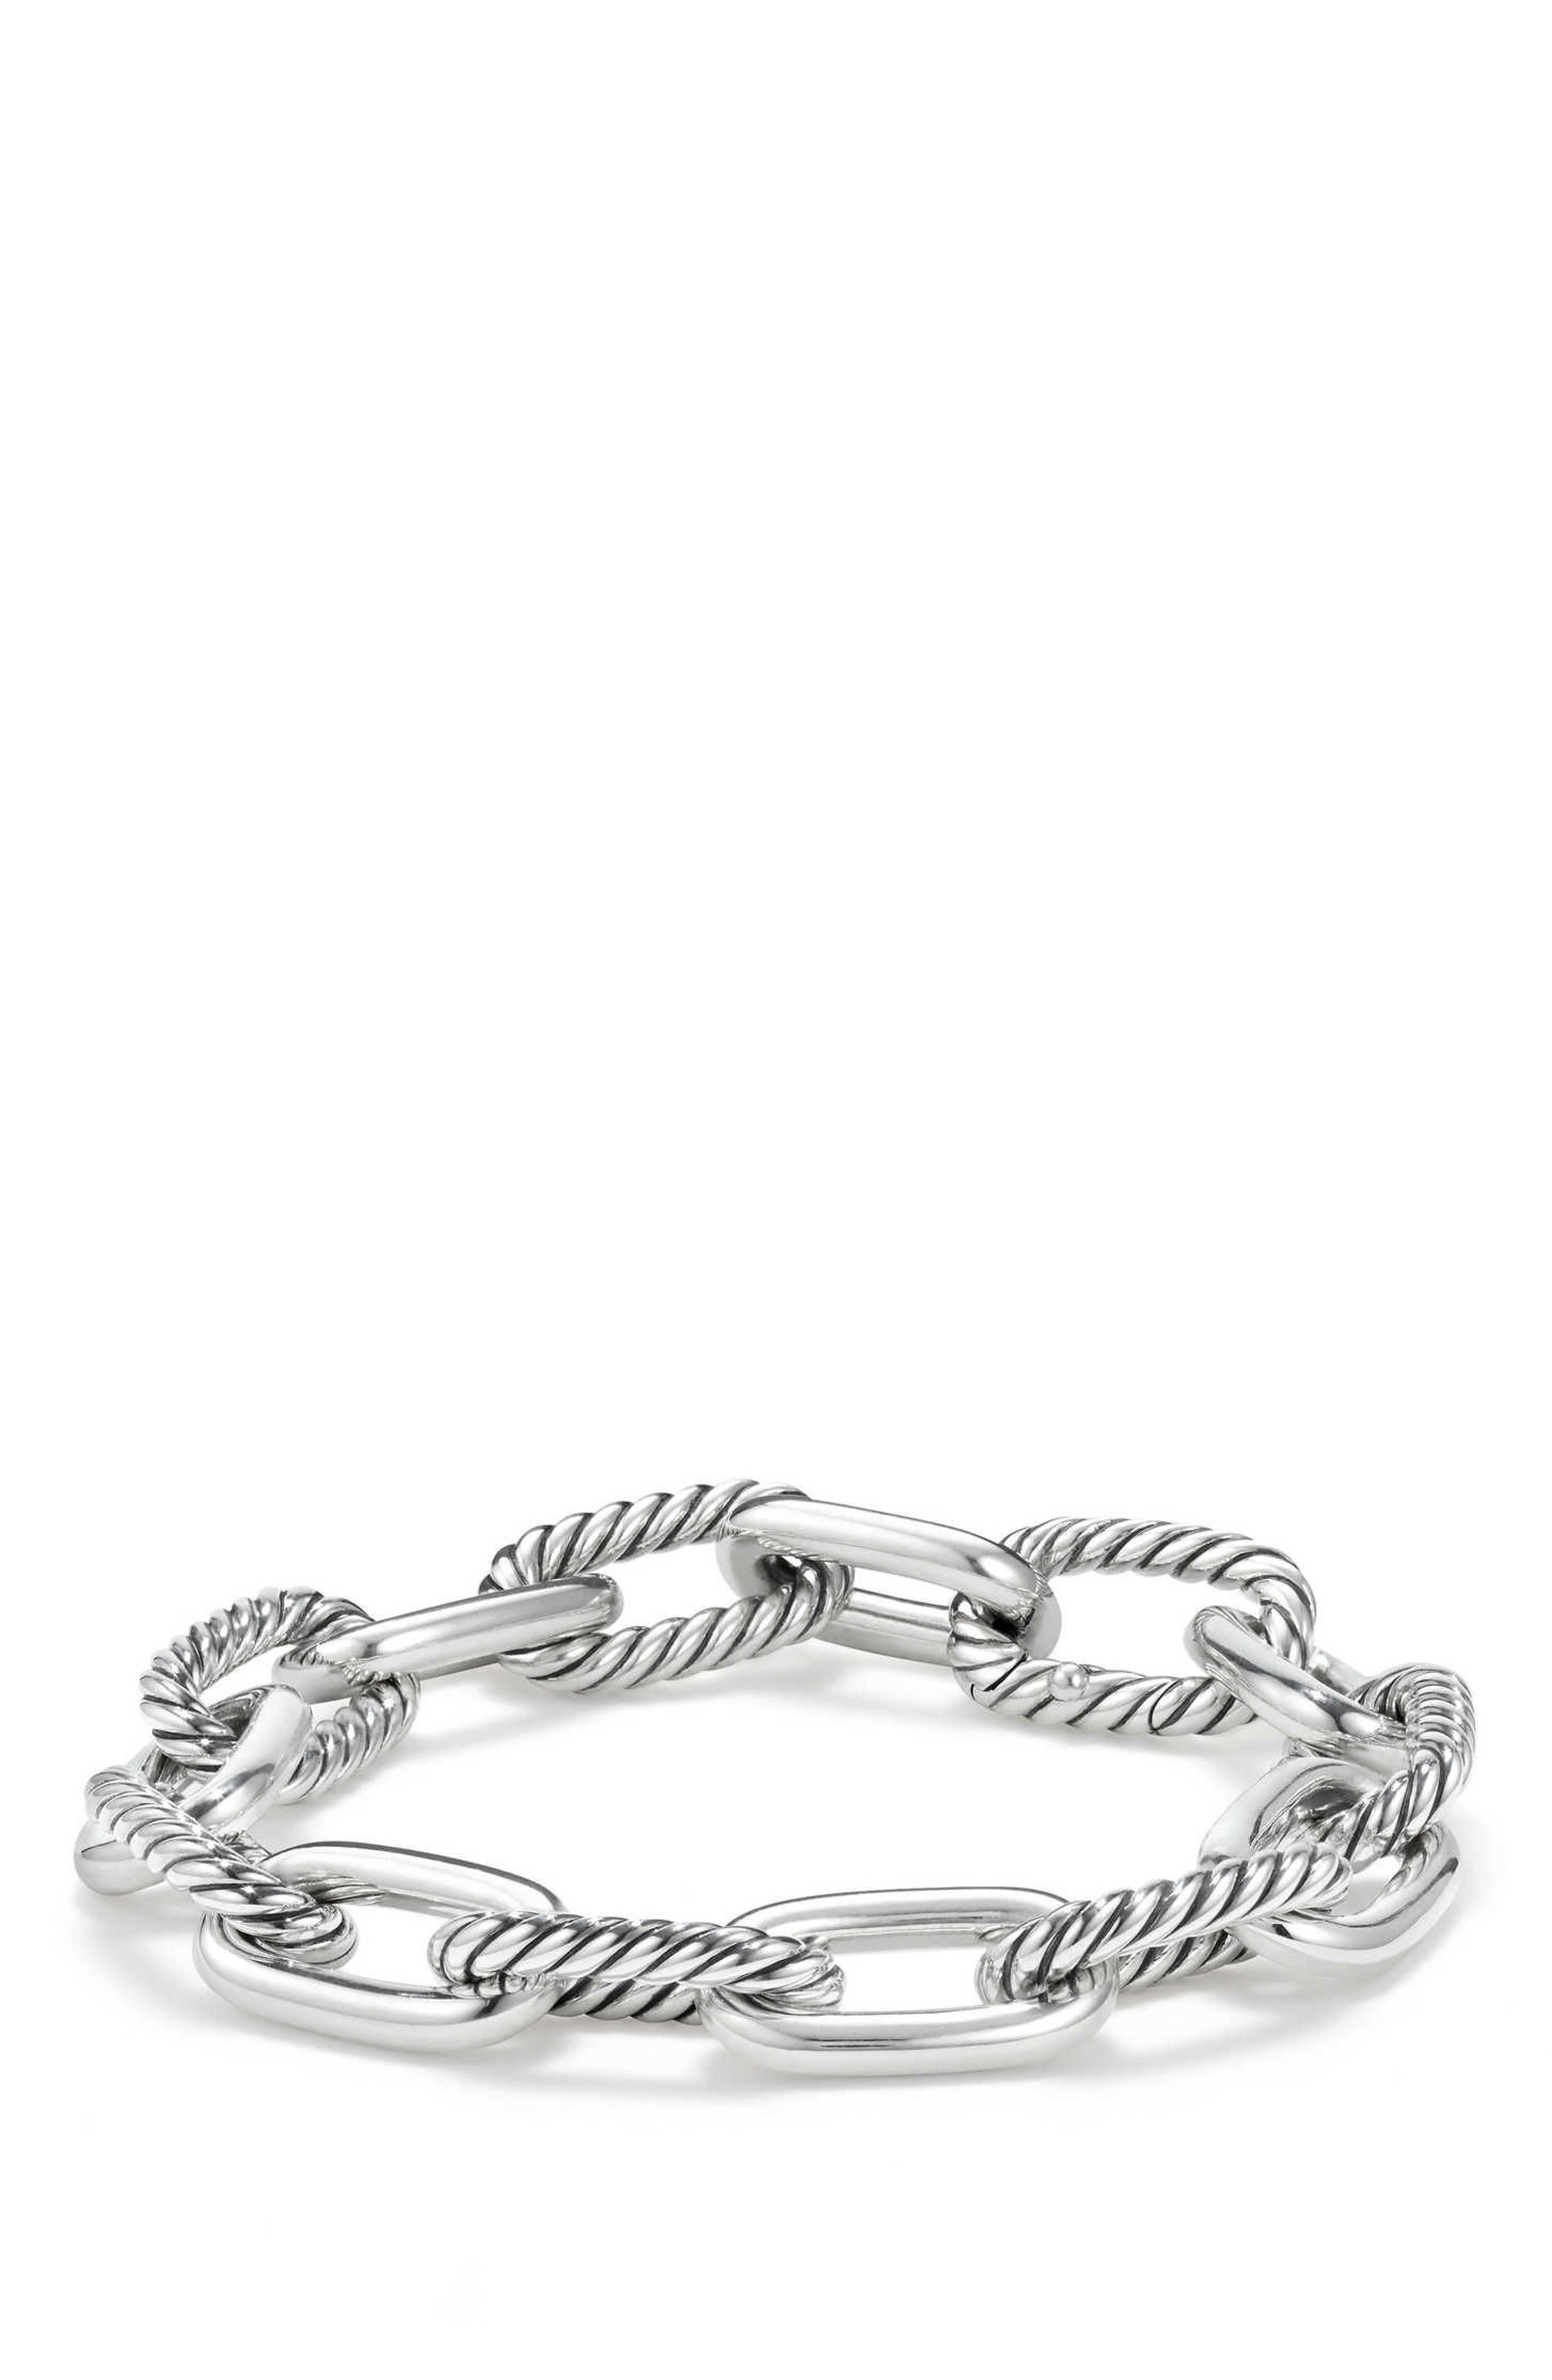 DY Madison Chain Medium Bracelet,                             Main thumbnail 1, color,                             Silver